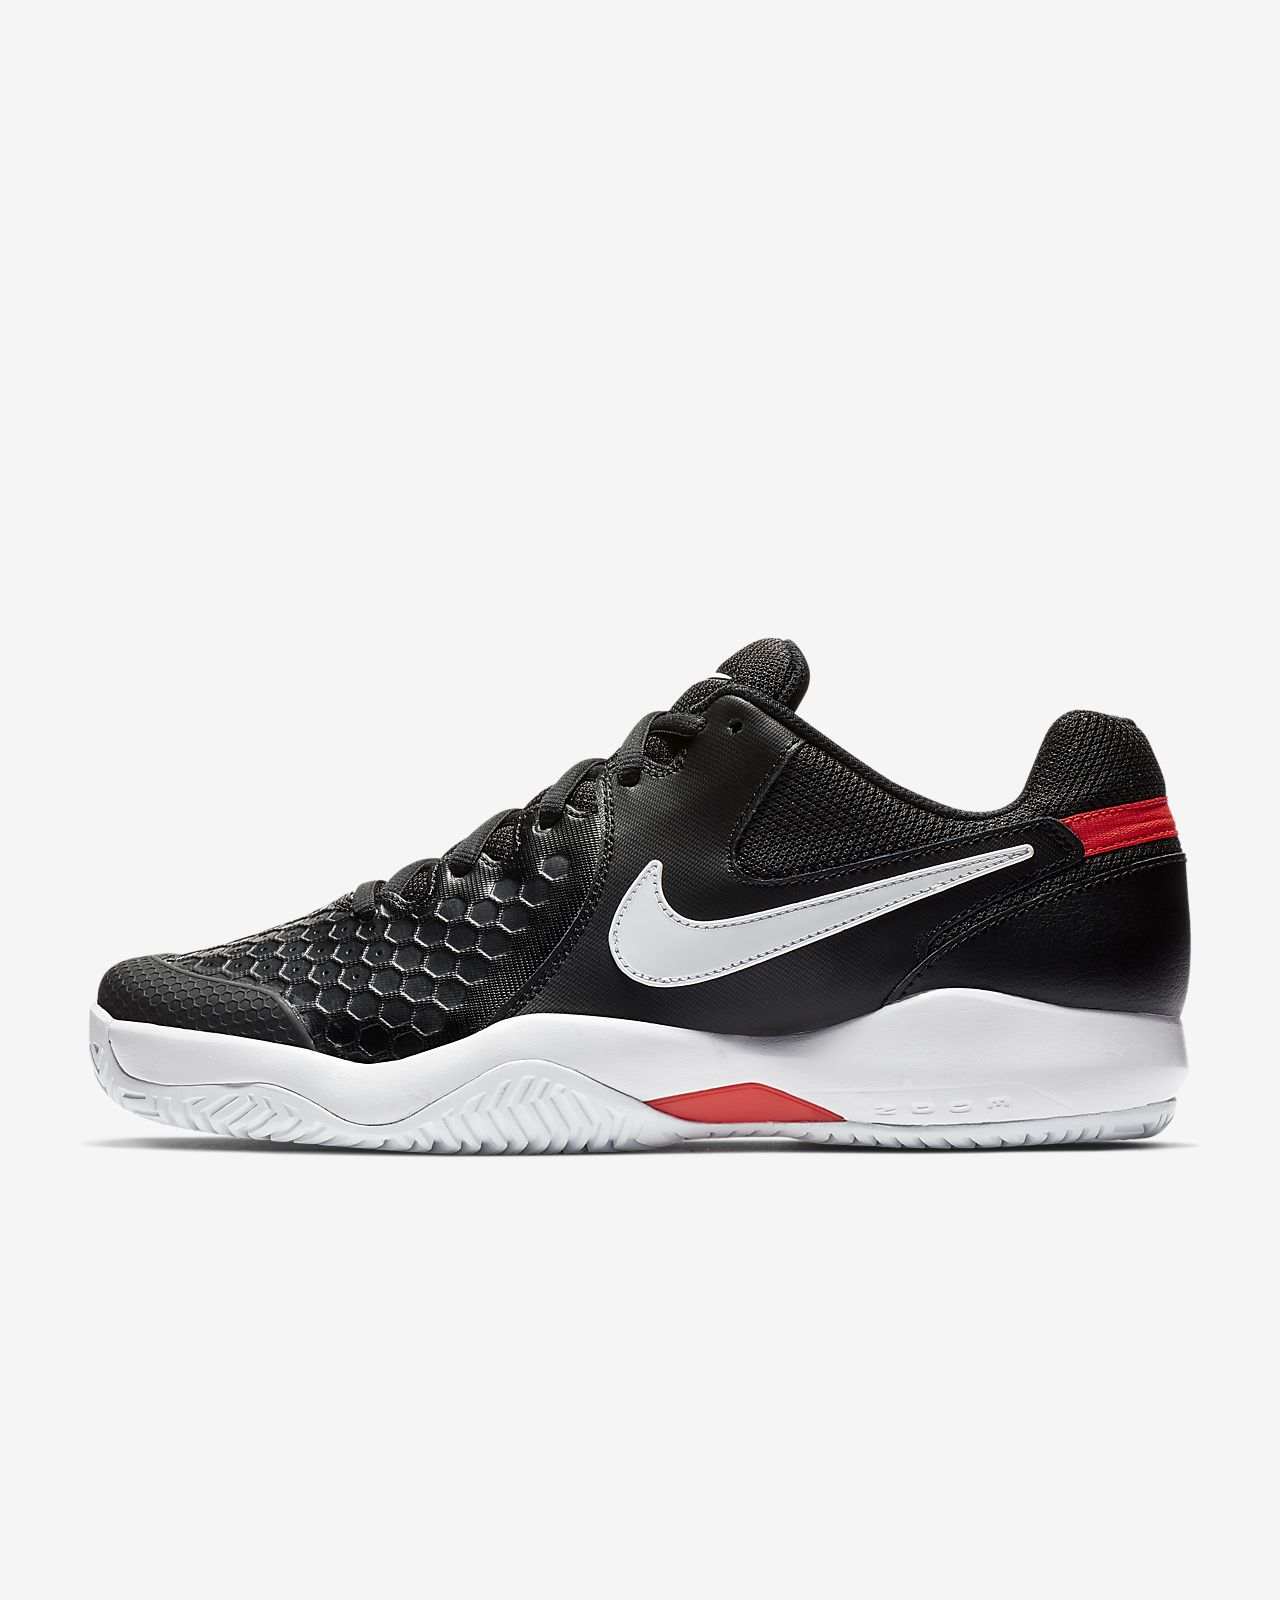 NikeCourt Air Zoom Resistance 男款硬地球場網球鞋